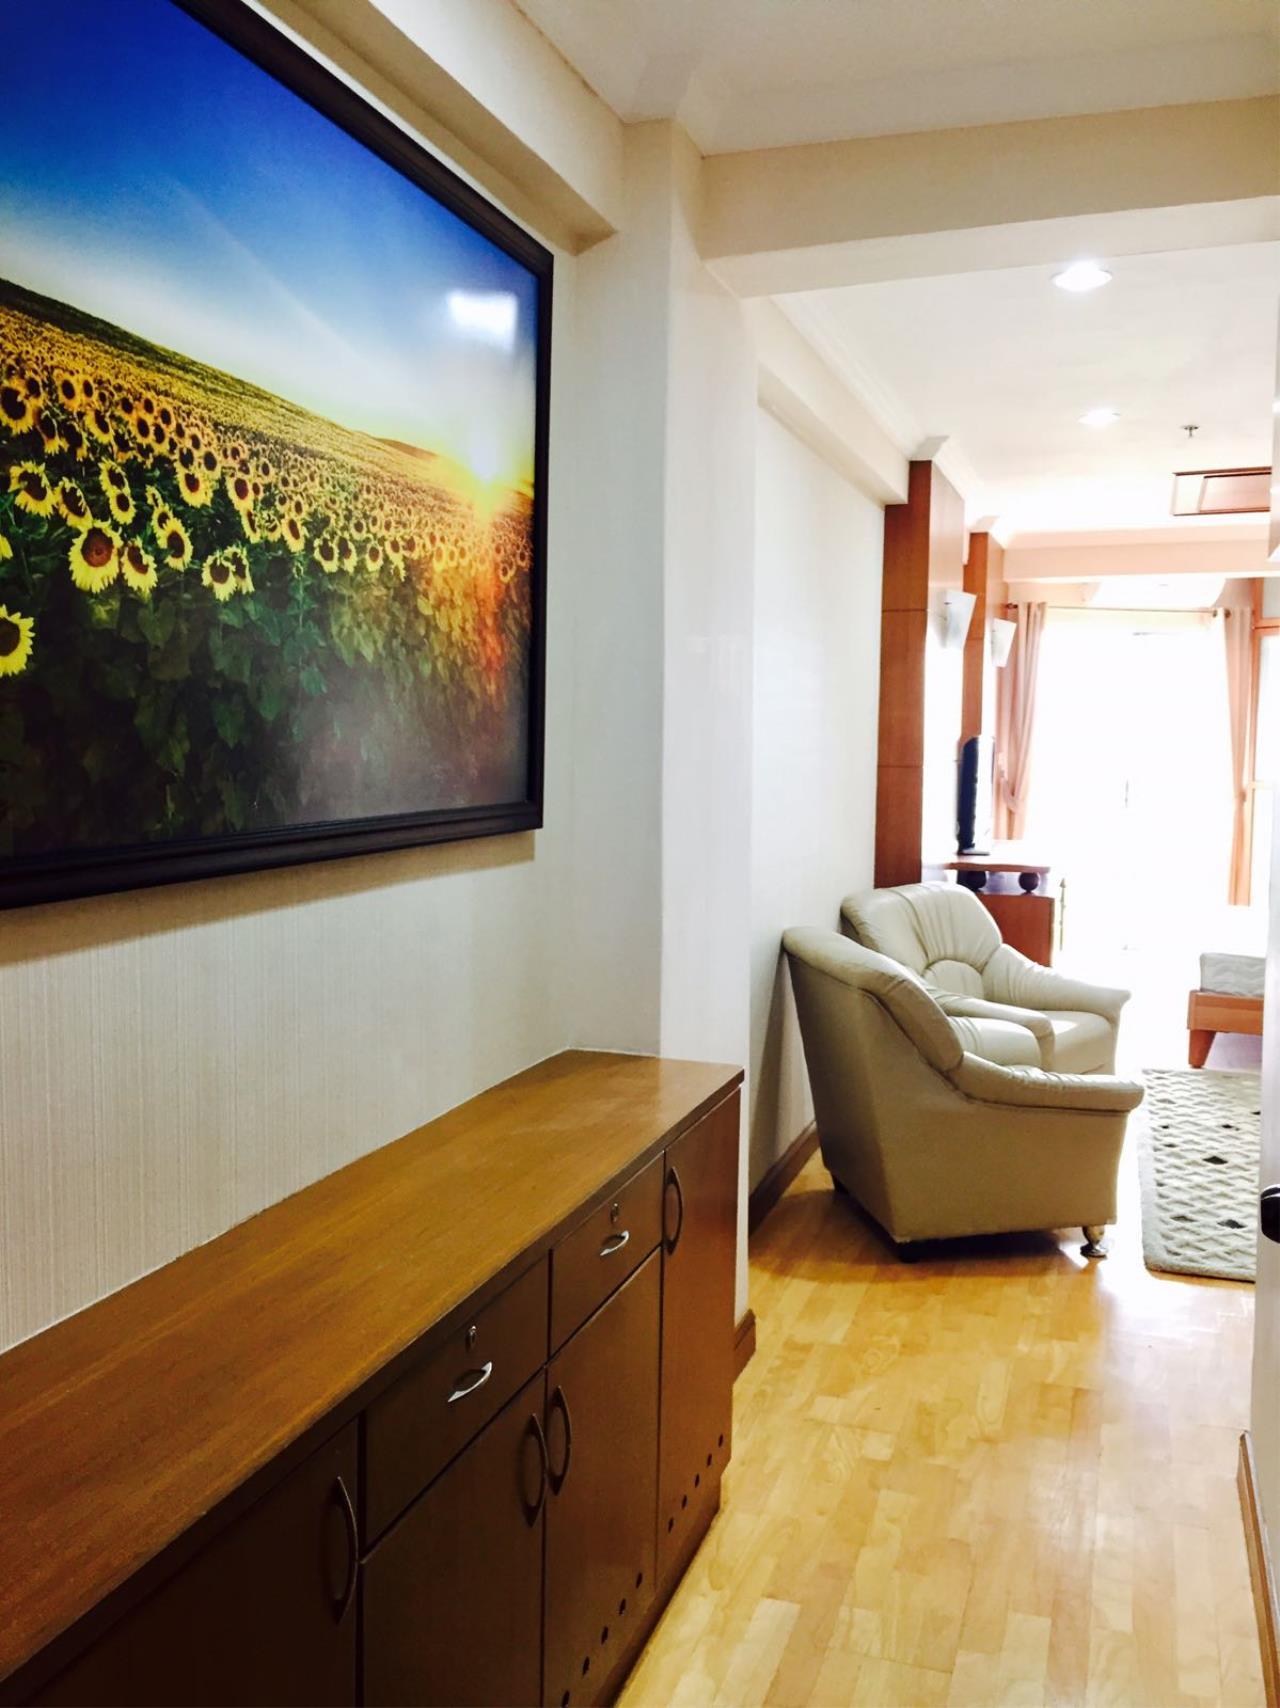 Immobilien Pattaya Agency's Jomtien Beach Condo S2, 32 Sqm. Studio, Sea View, Foreigner Quota 8